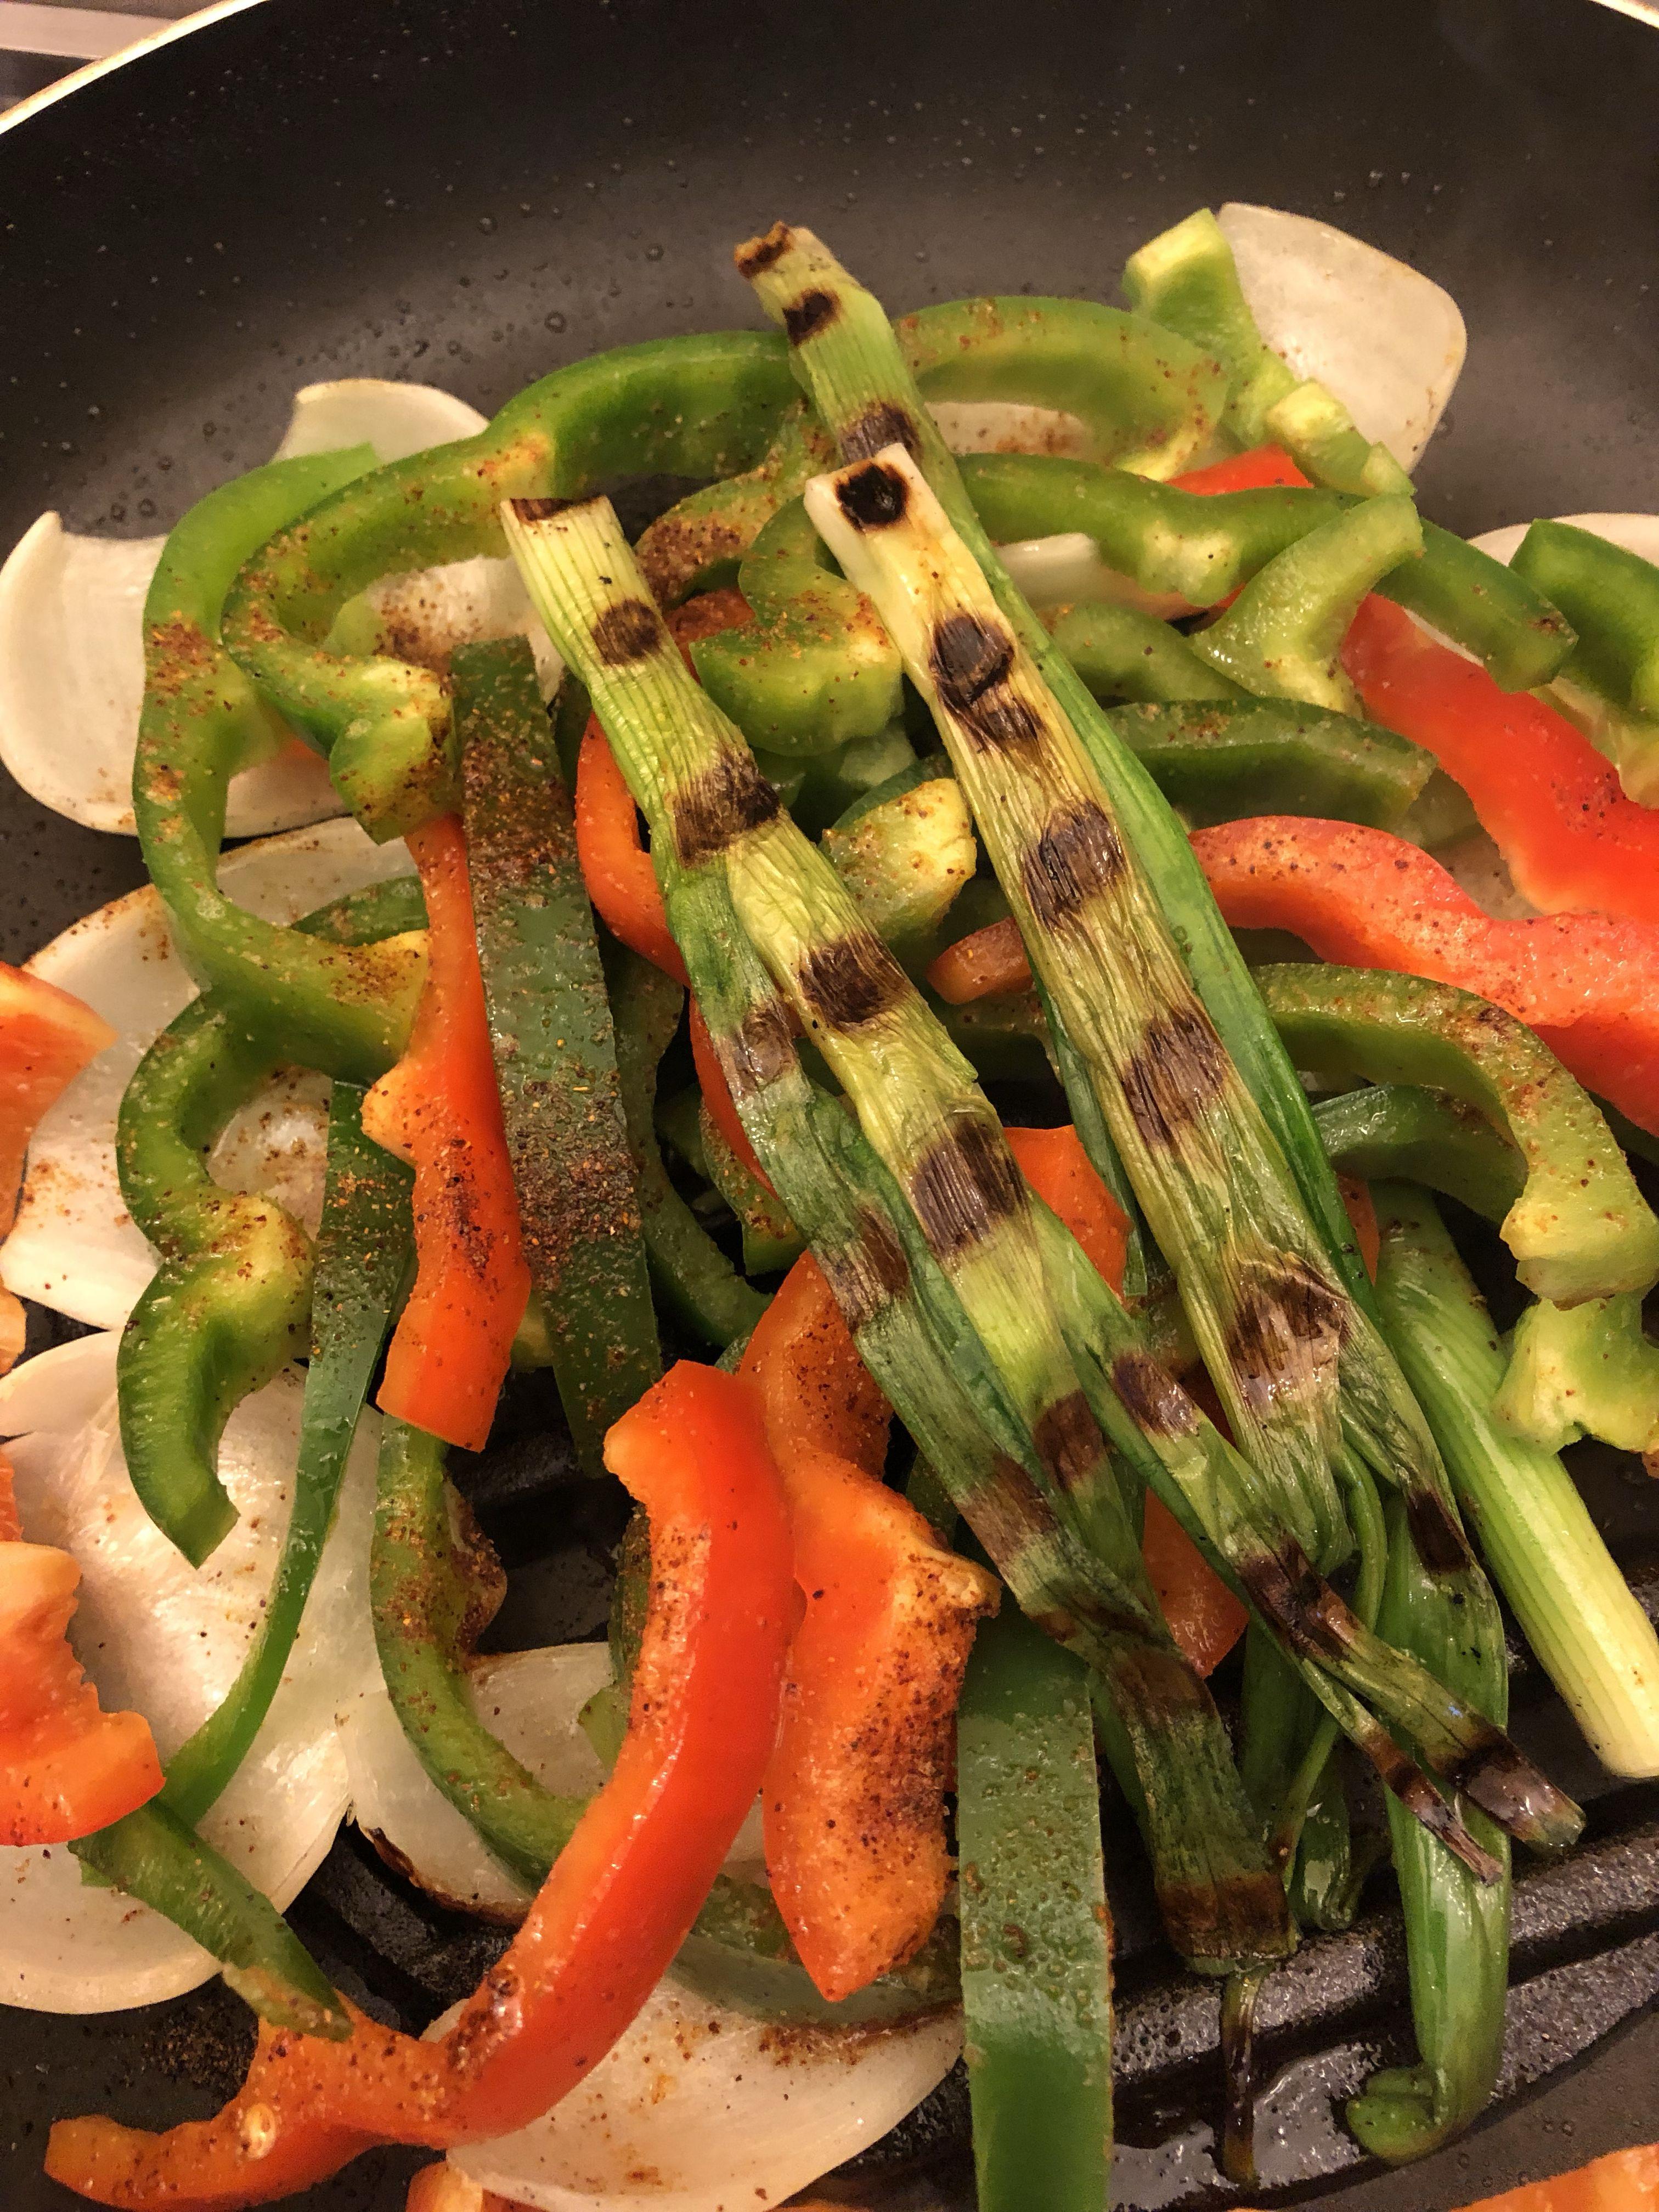 Vegan Veganrecipes Veganfood Delici Healthy Grill